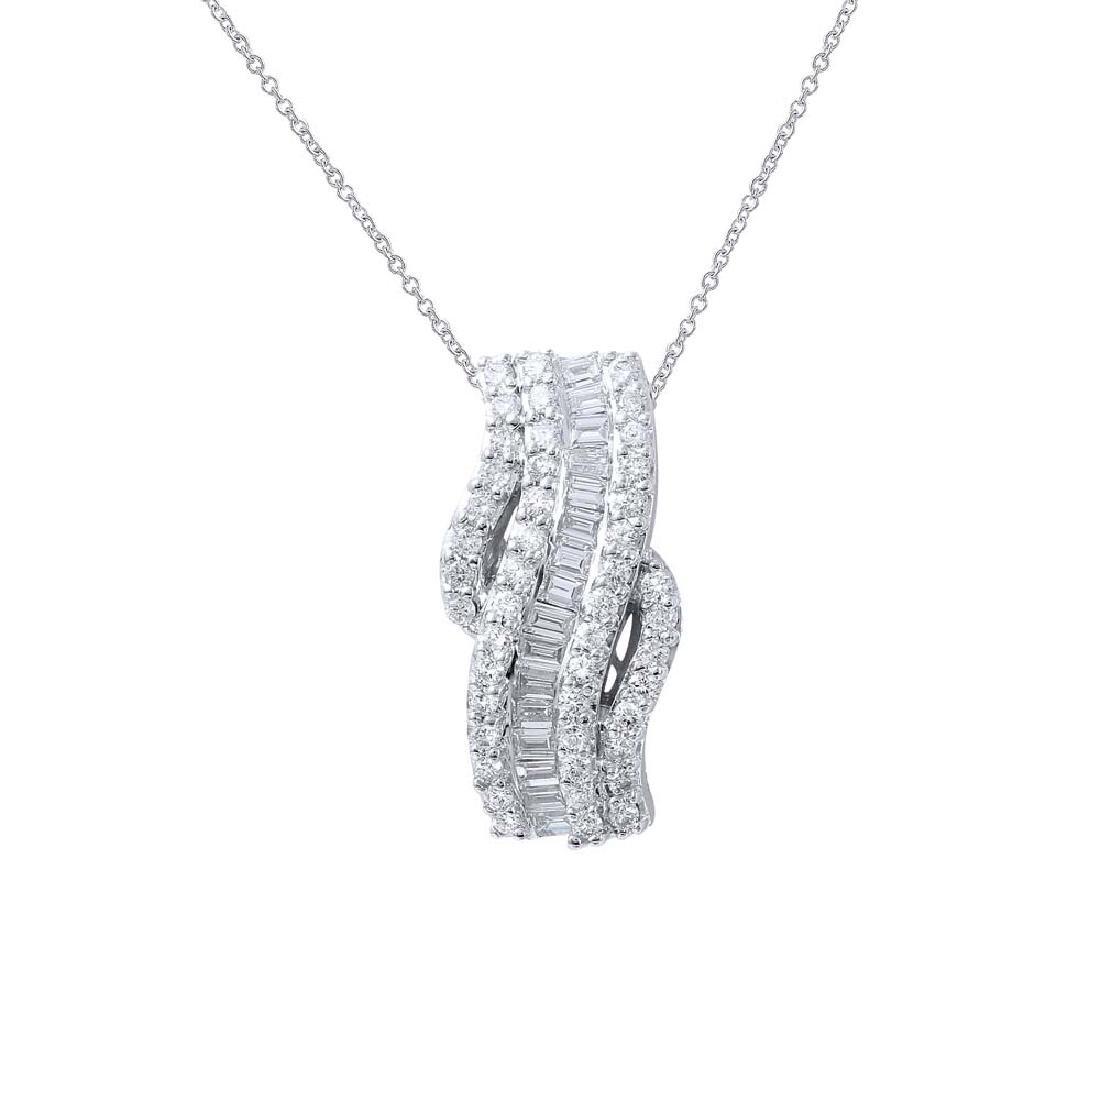 Genuine 1.01 TCW 18K White Gold Ladies Necklace